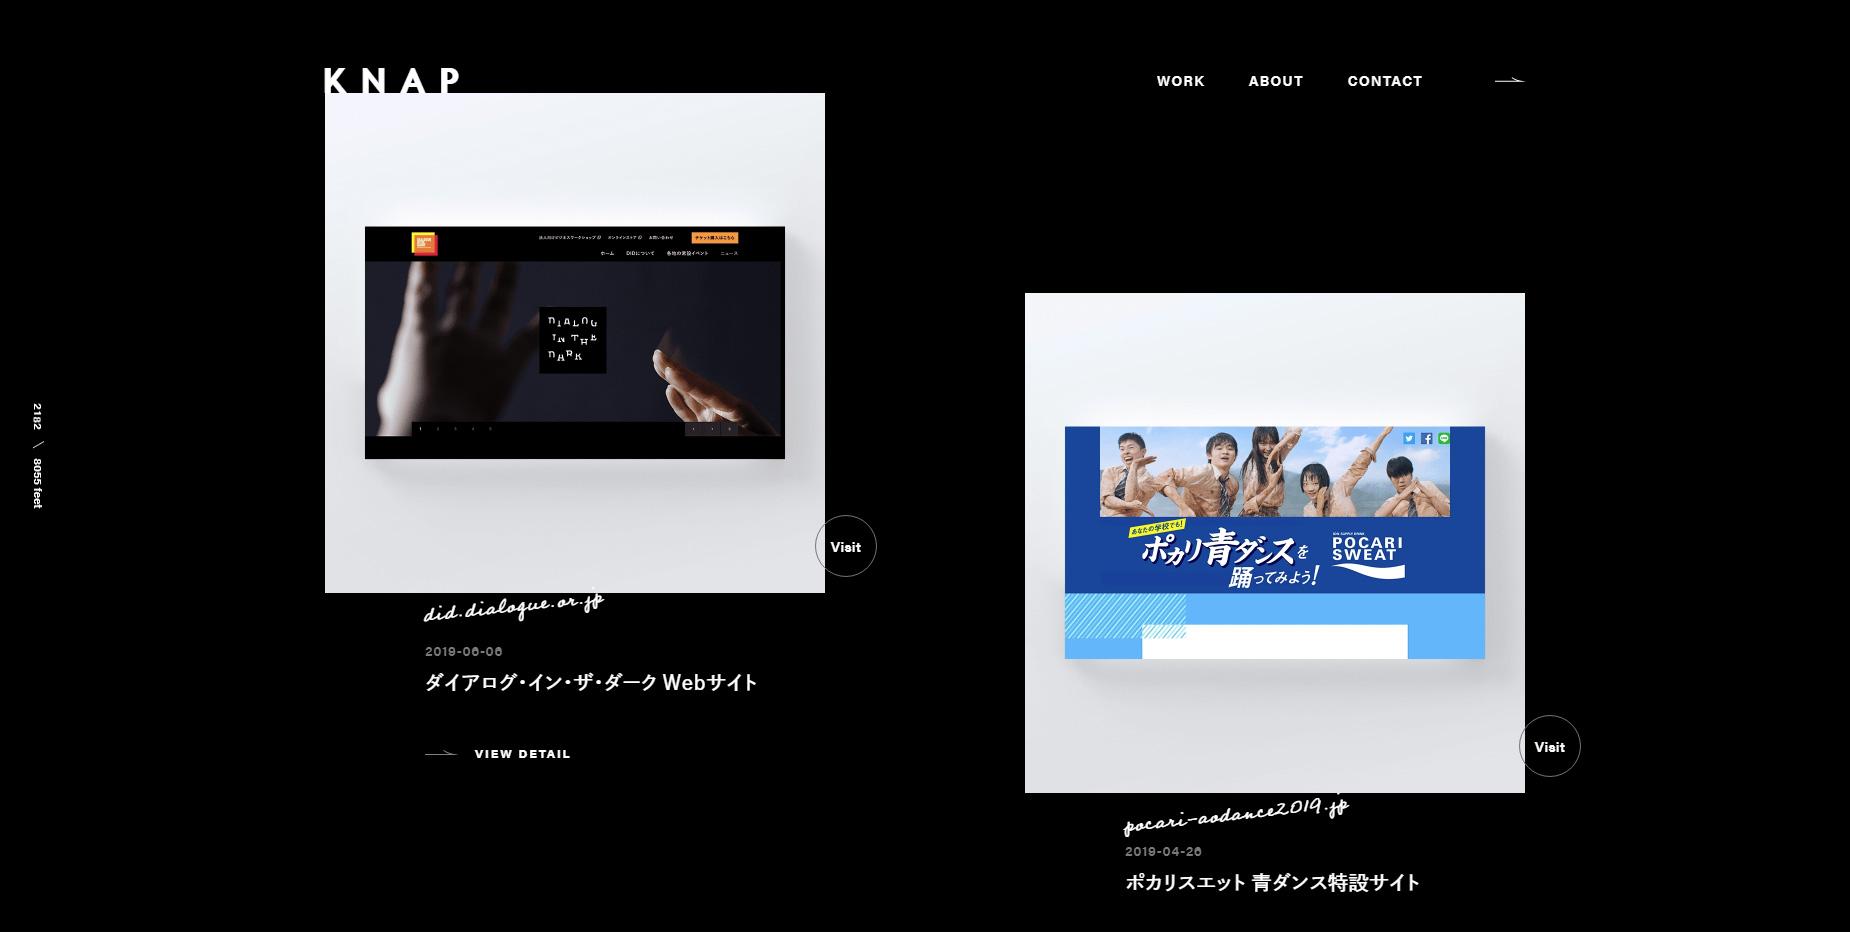 KNAP inc. Design Agency - Website of the Day